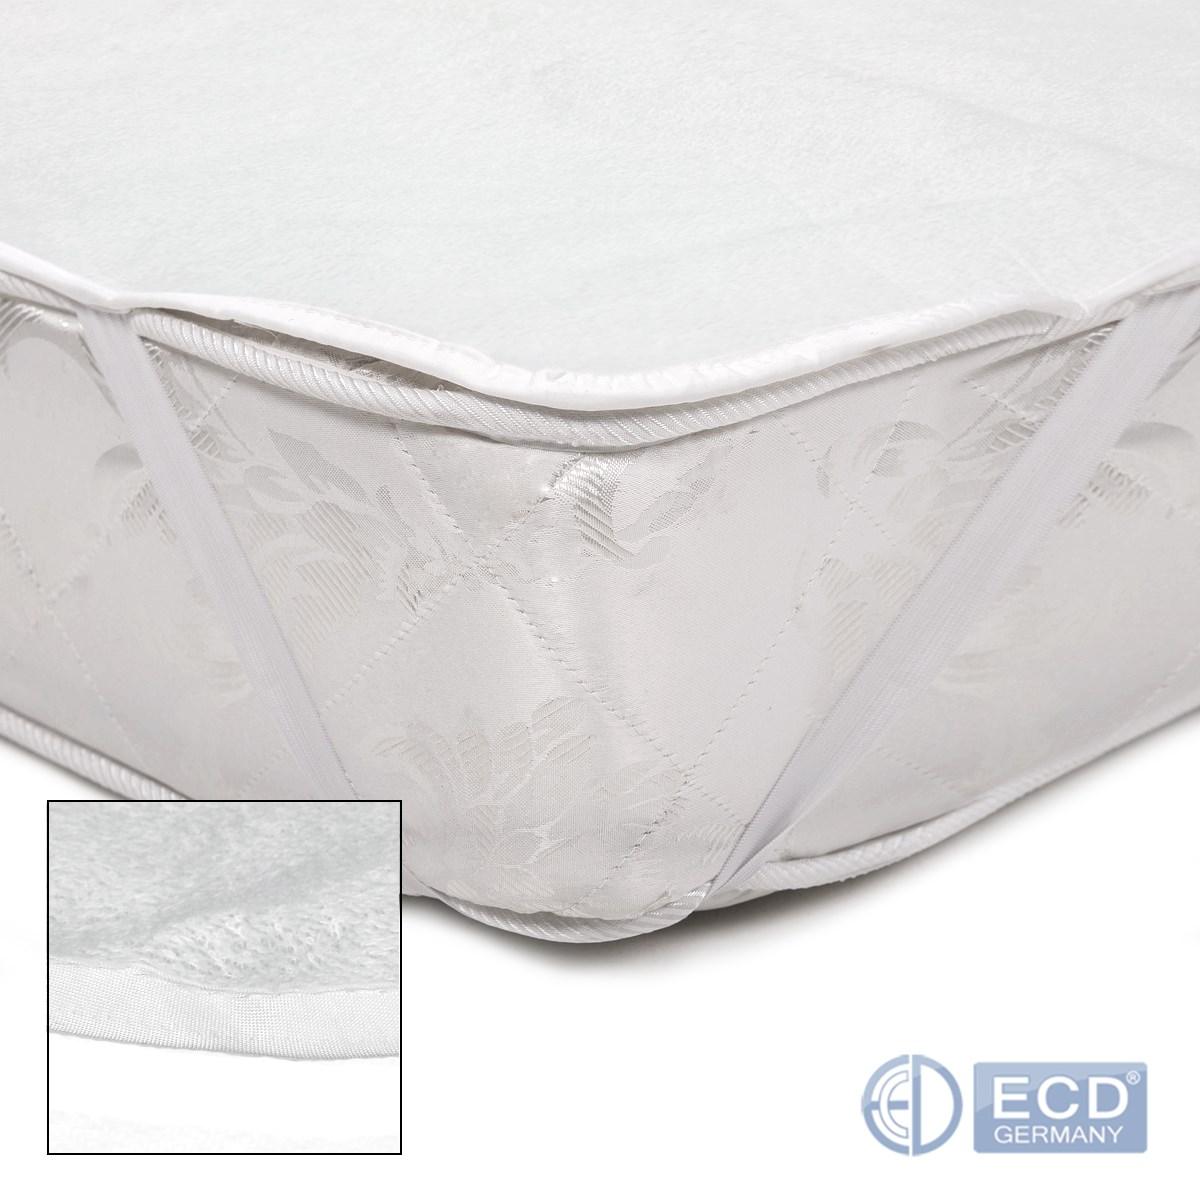 Protector-de-colchon-100-algodon-fundas-impermeables-diferentes-tamanos-cama